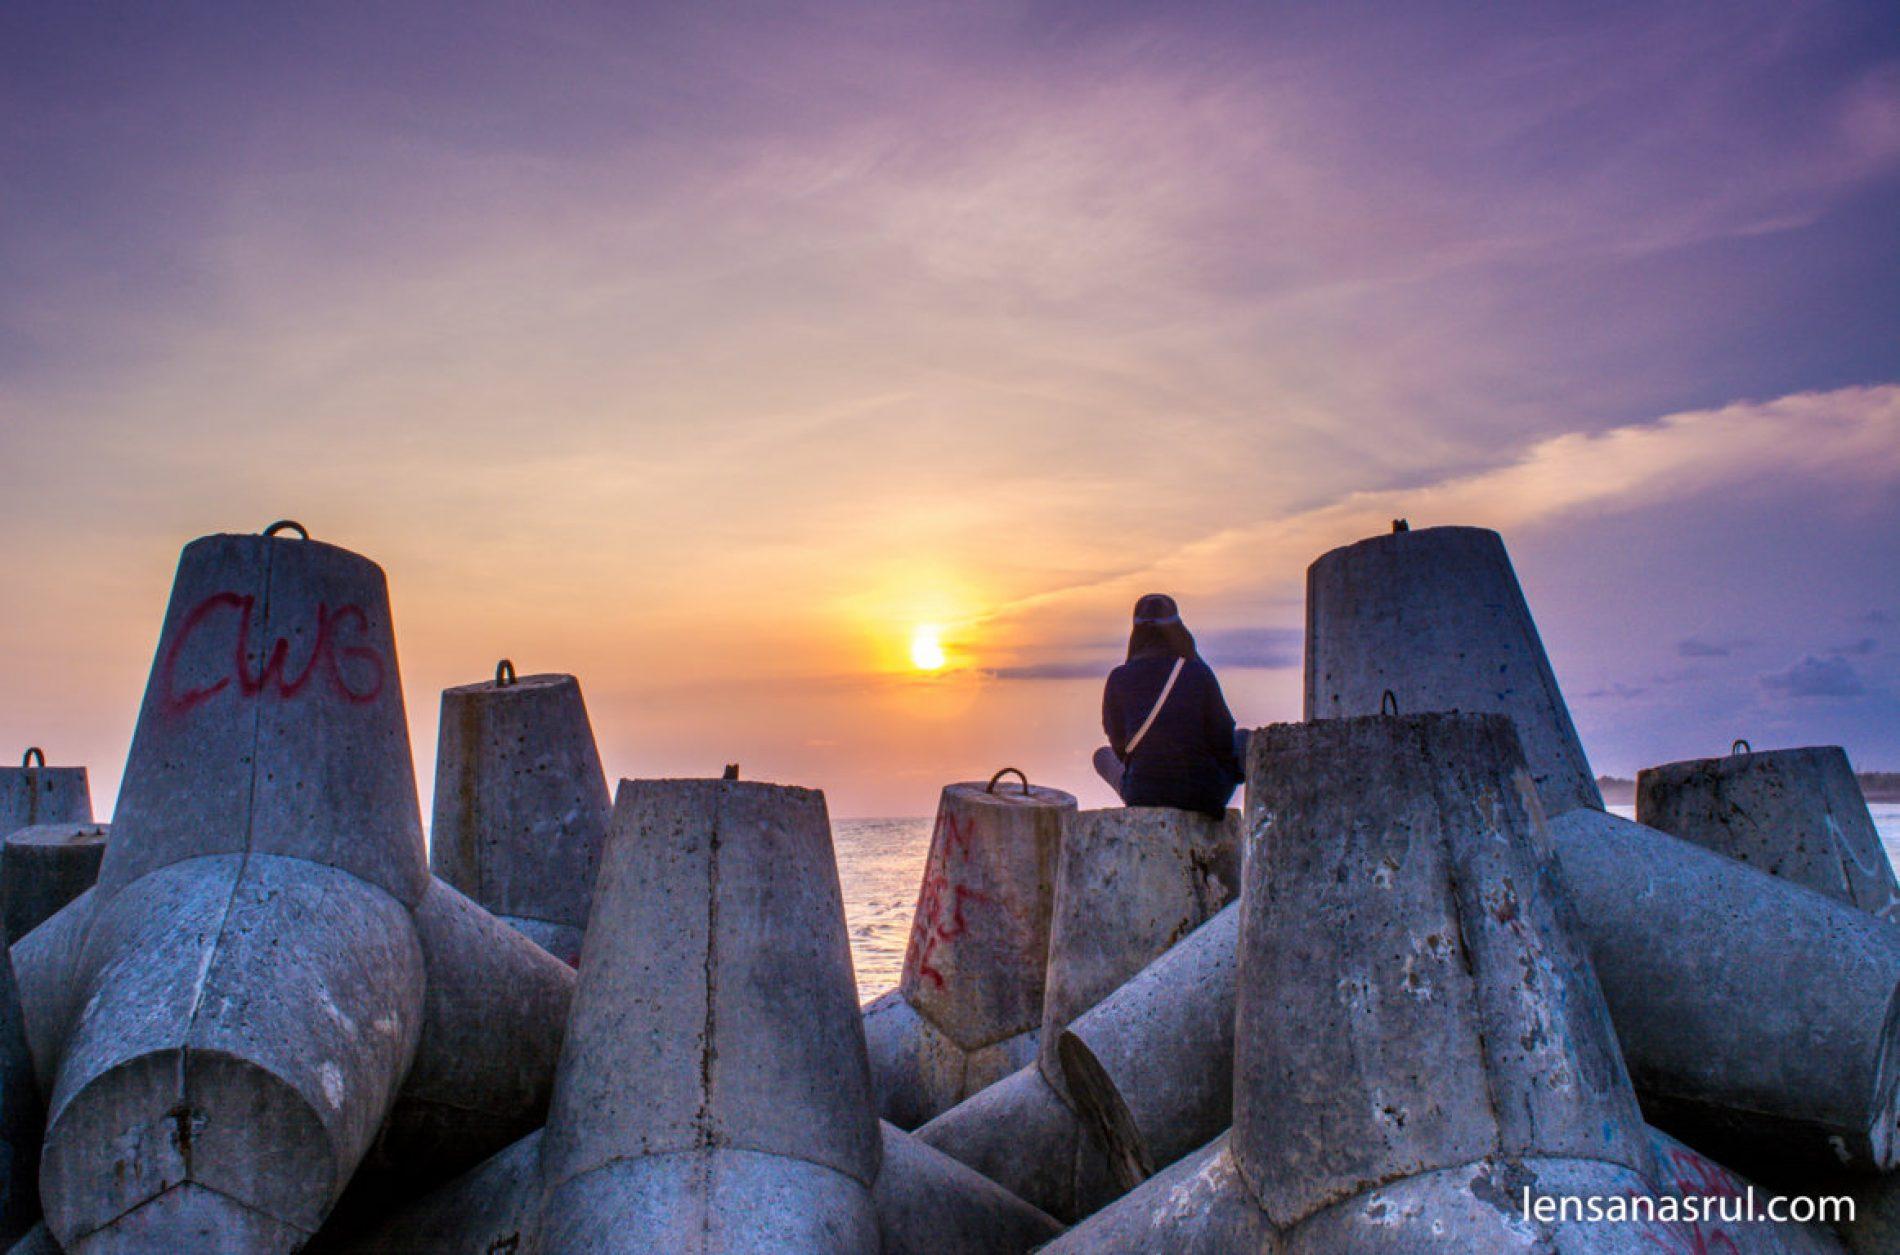 Pantai Glagah Kulonprogo, Destinasi Keluarga dan Panorama Sunset